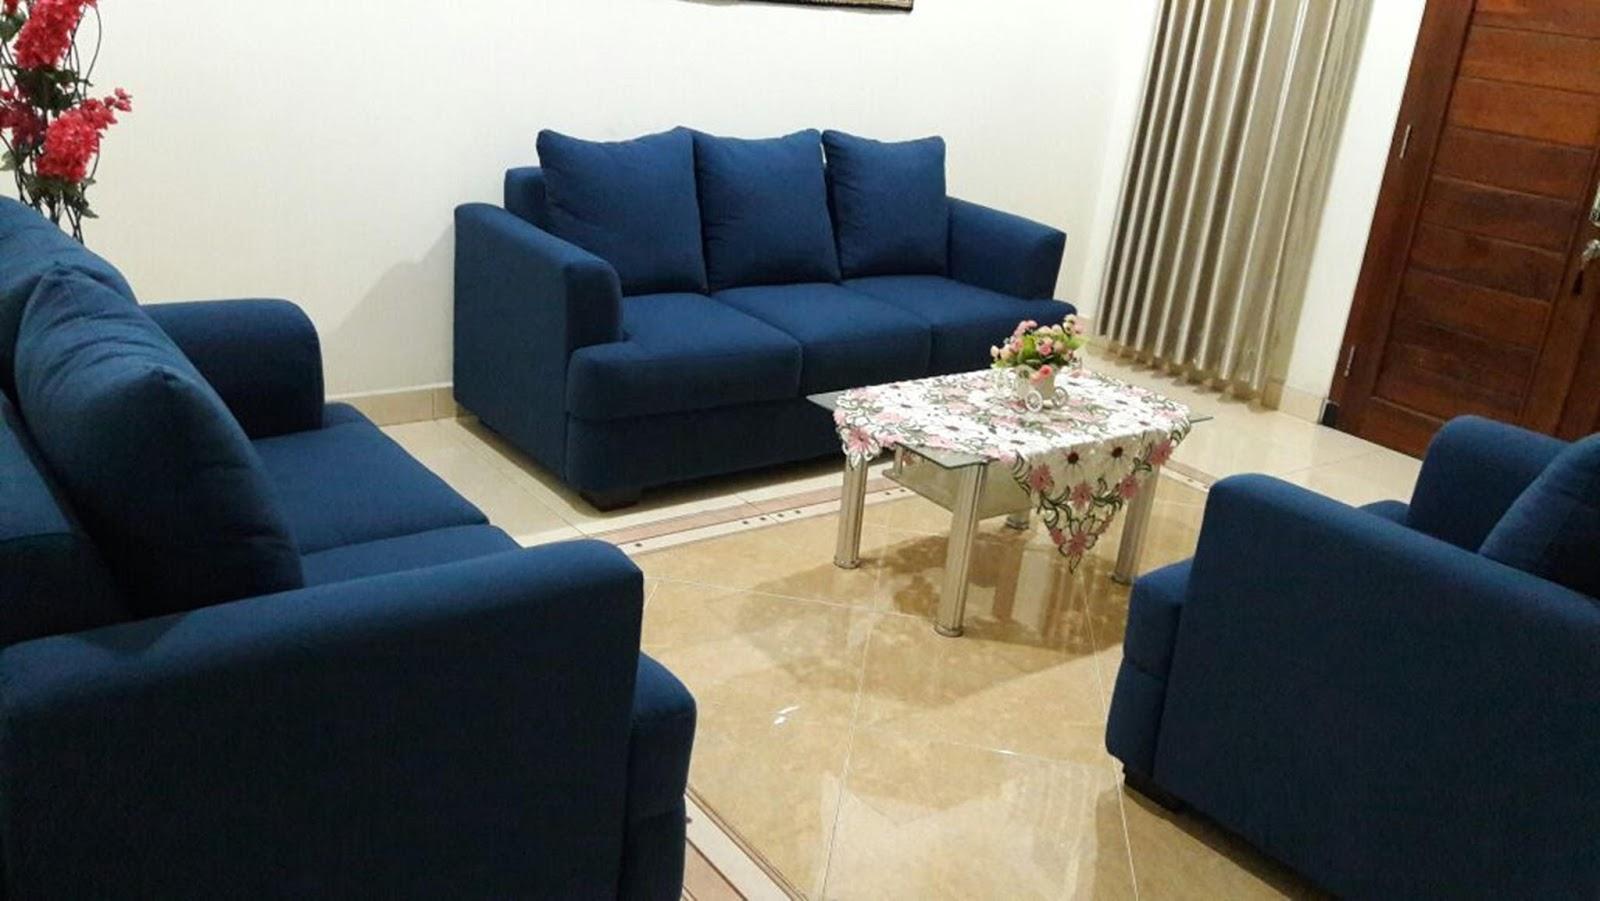 Sofa Minimalis Murah Di Jogja Refil Sofa